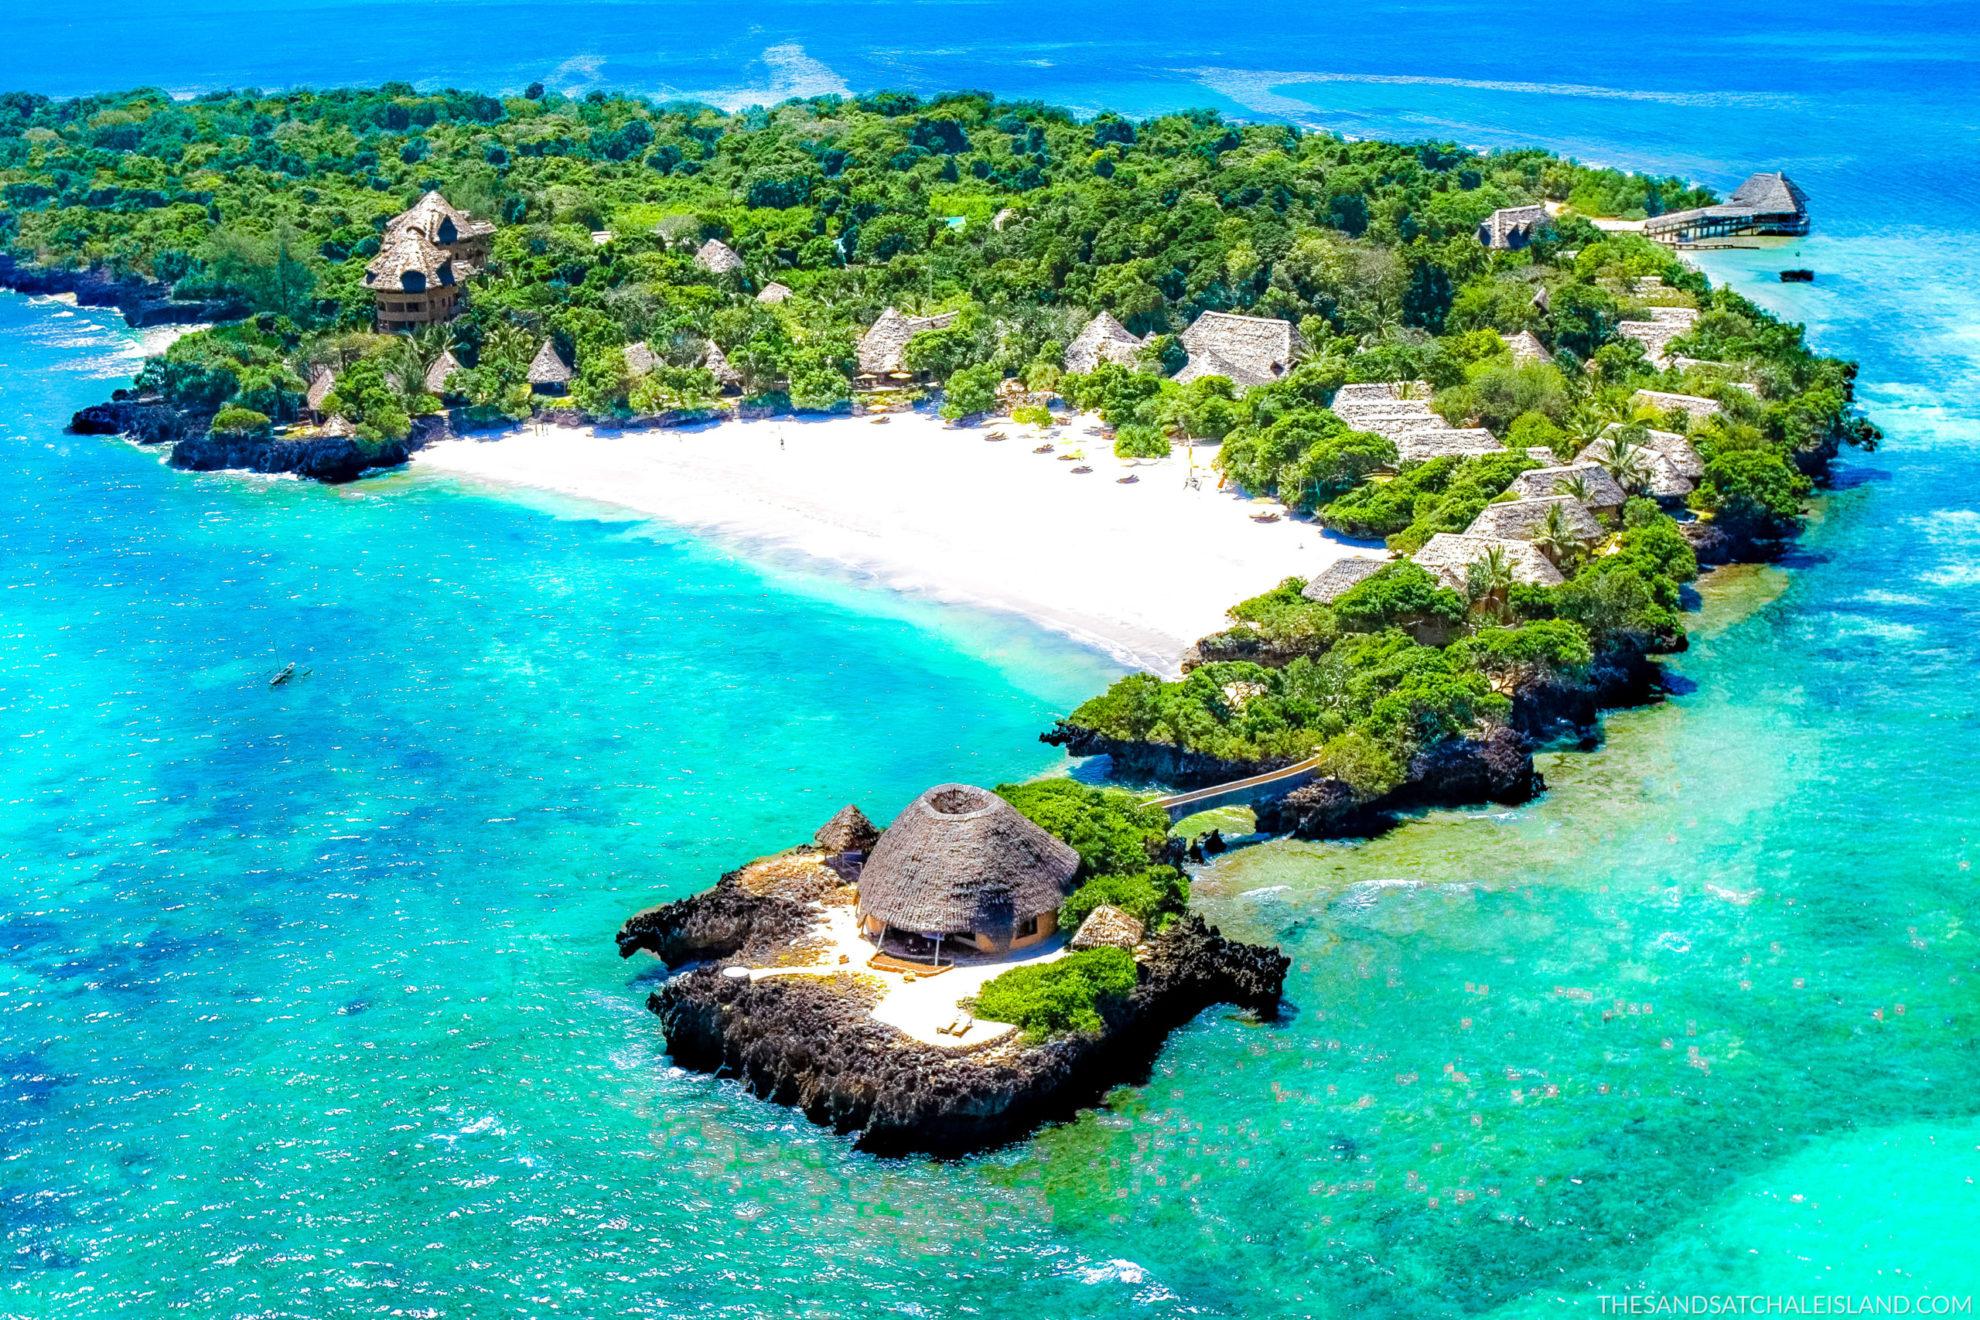 Kenya - Chale Island - 12890 - Ariel view of Villas